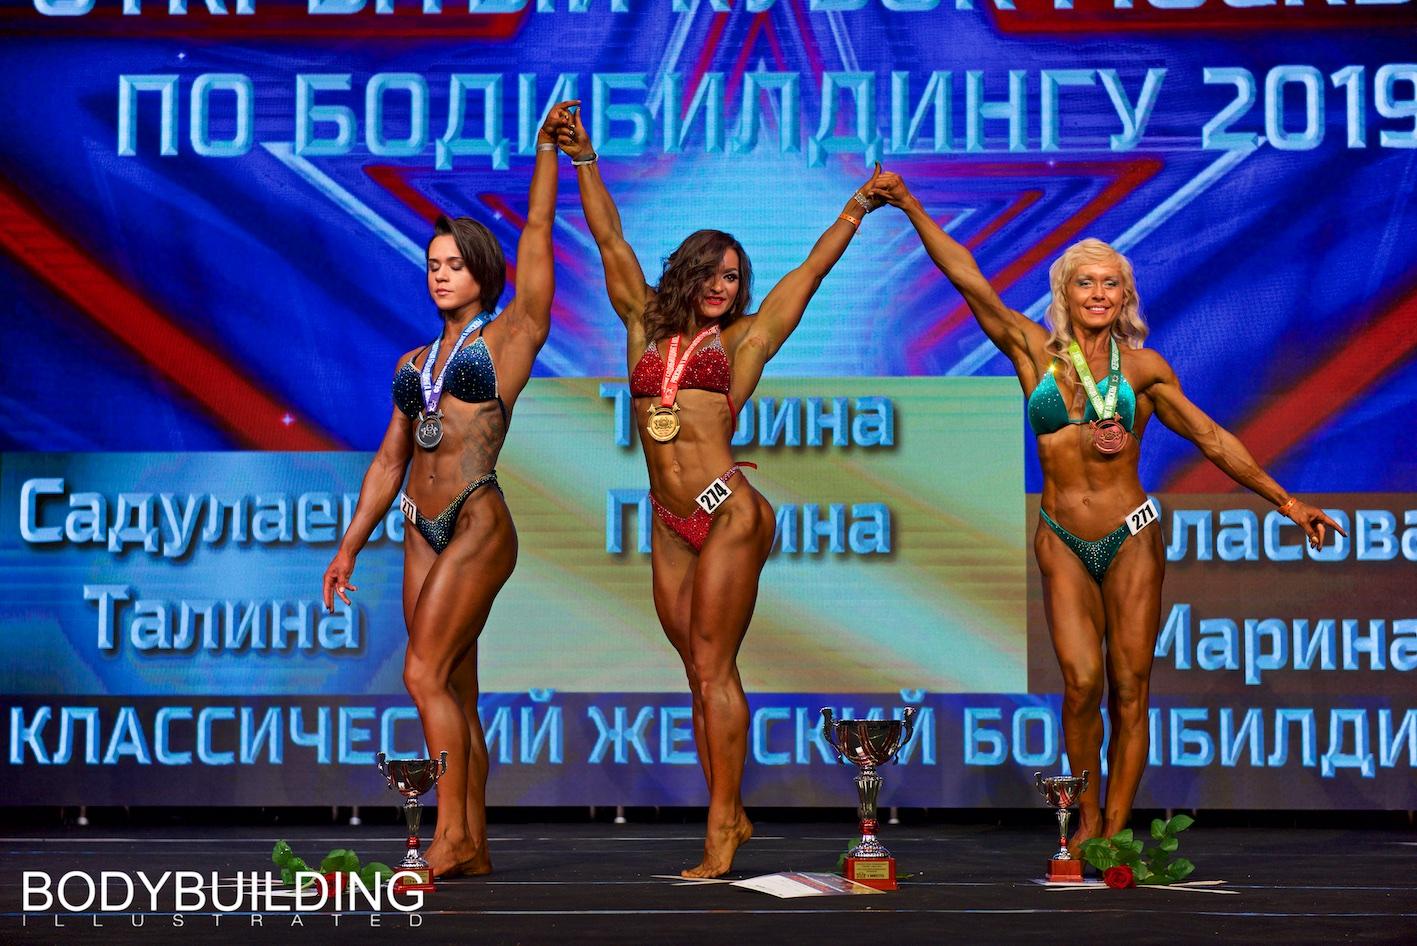 Кубок Москвы по бодибилдингу 2019 Классический женский бодибилдинг